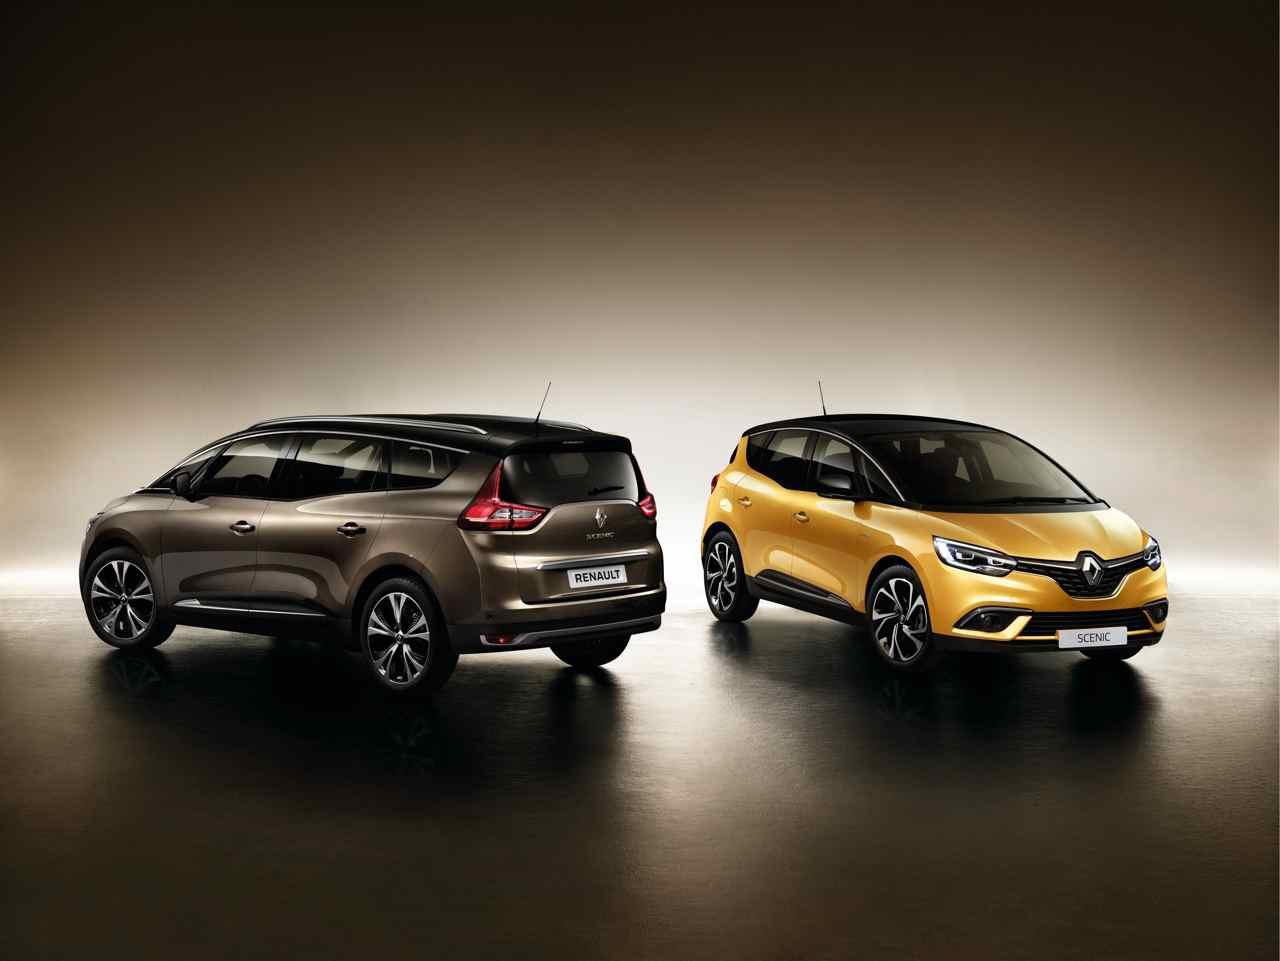 Renault Scenic 2016 y Renault Grand Scenic 2016